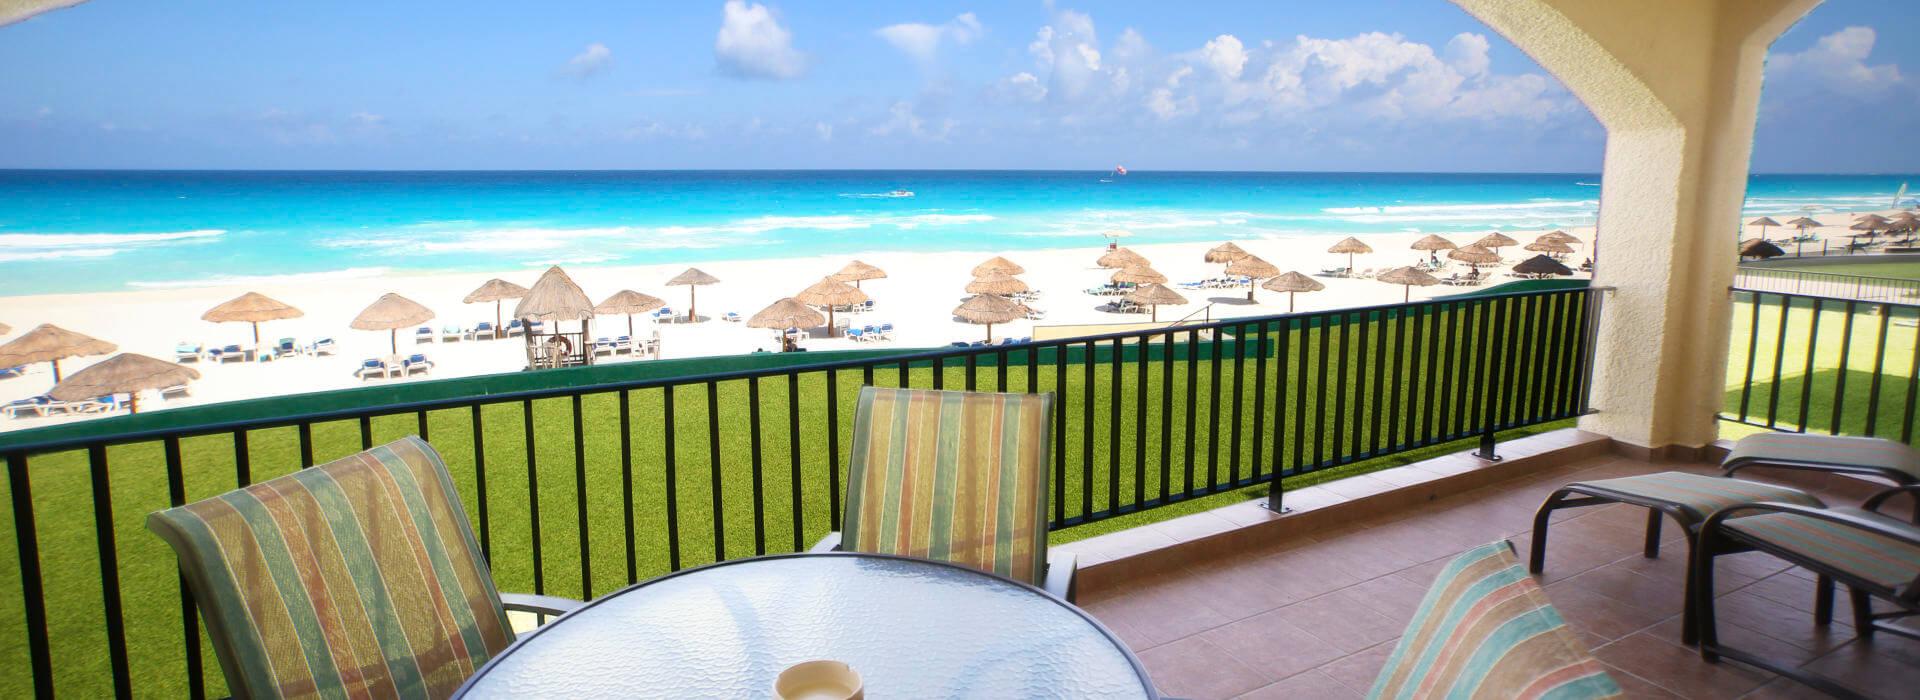 Beachfront balcony in a Cancun Resort